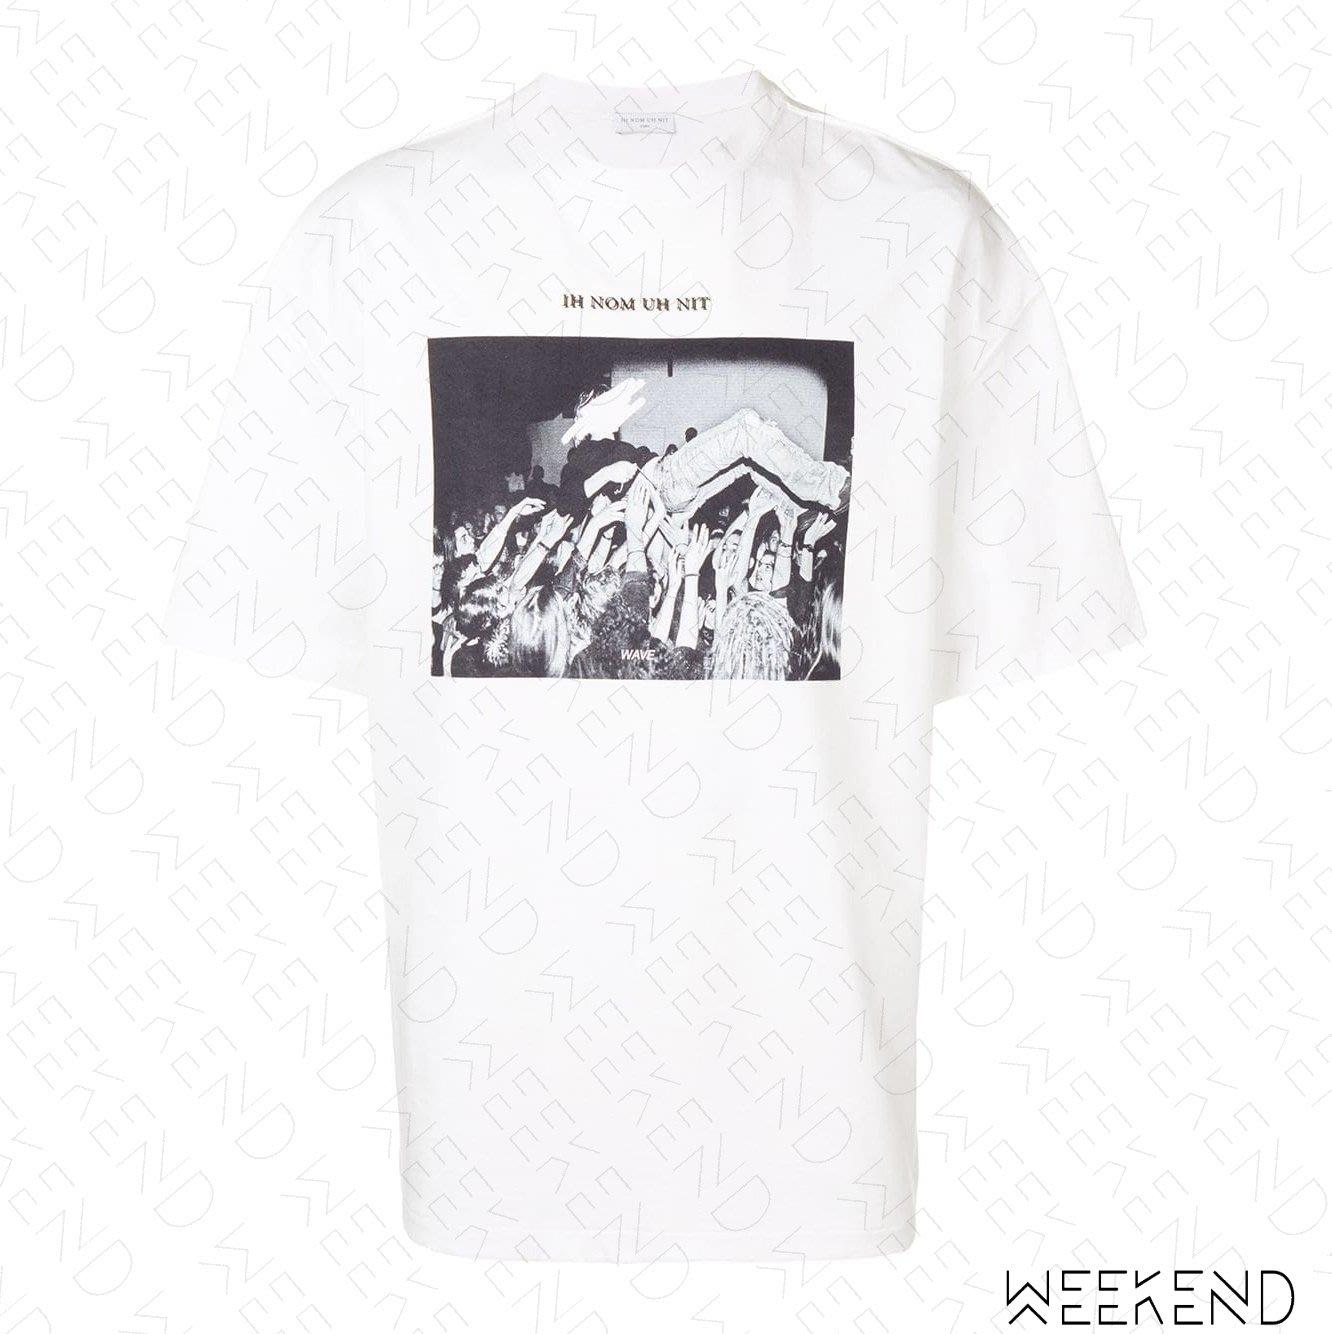 【WEEKEND】 IH NOM UH NIT Crowd Surf 男女同款 短袖上衣 T恤 白色 19春夏